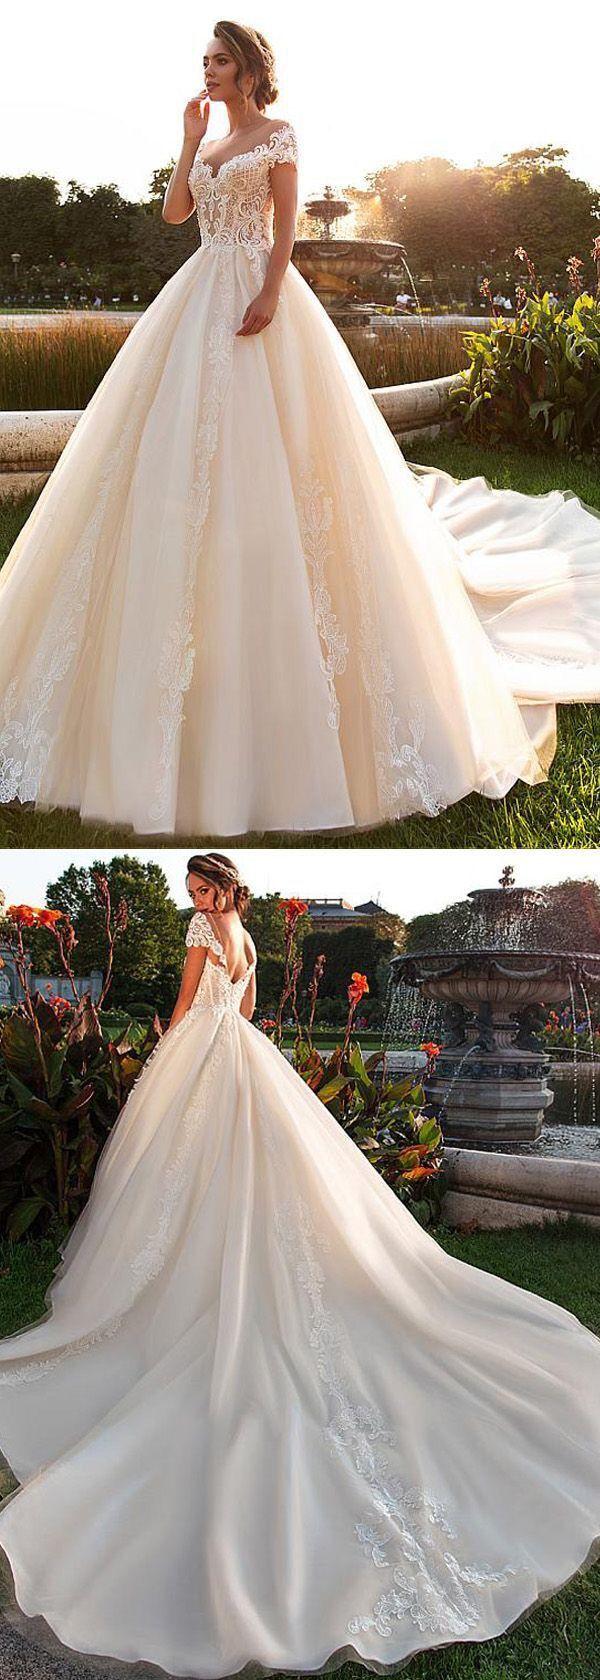 Wedding-Dresses-1638